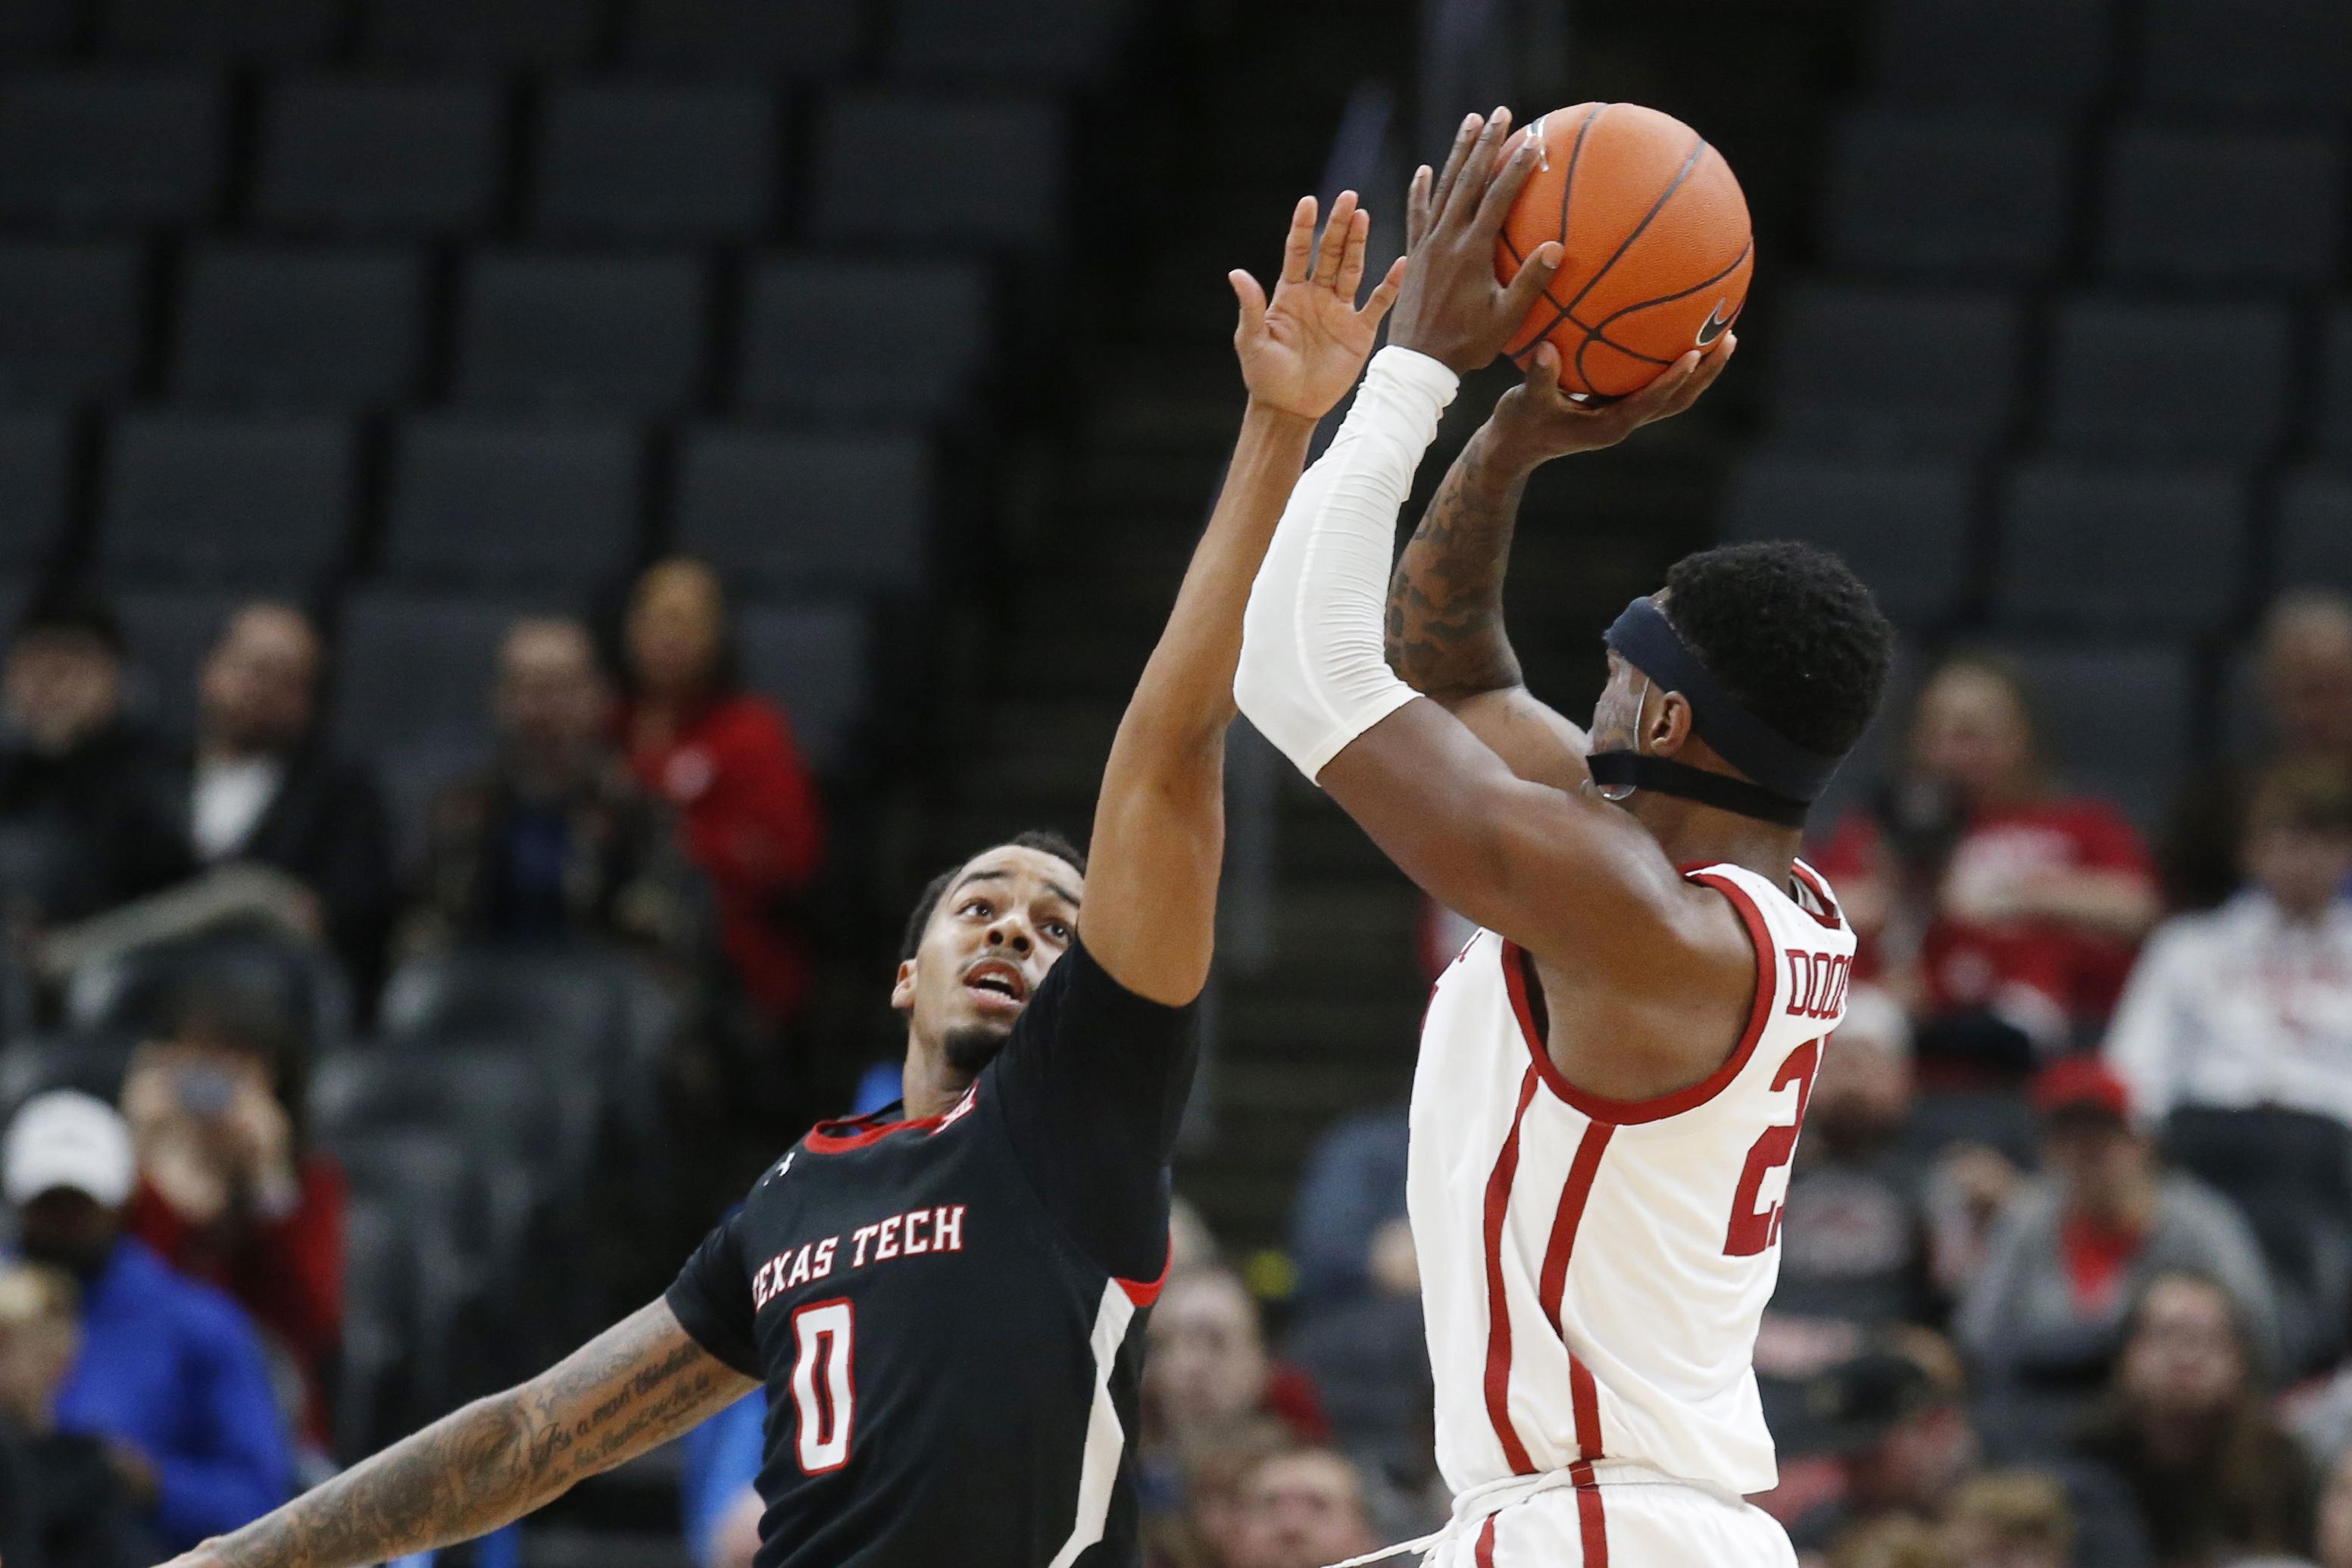 Doolittle's 19 points lead Oklahoma past No. 22 Texas Tech